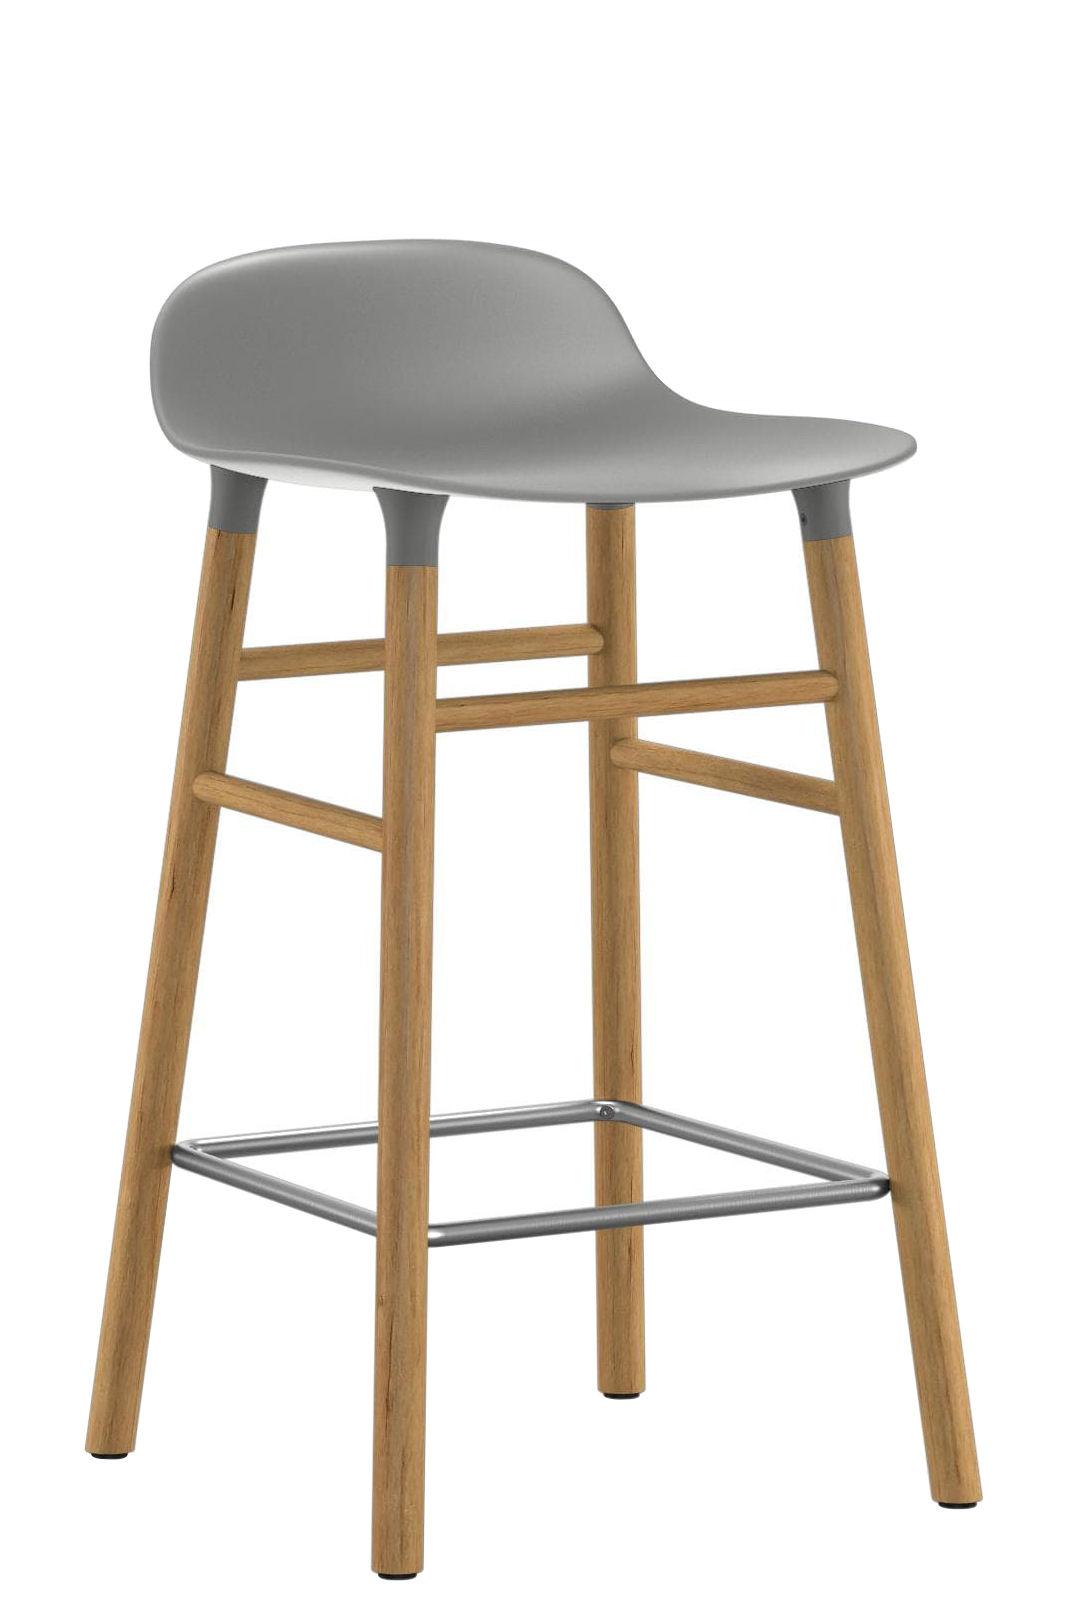 Furniture - Bar Stools - Form Bar stool - H 65 cm / Oak leg by Normann Copenhagen - Grey / oak - Oak, Polypropylene